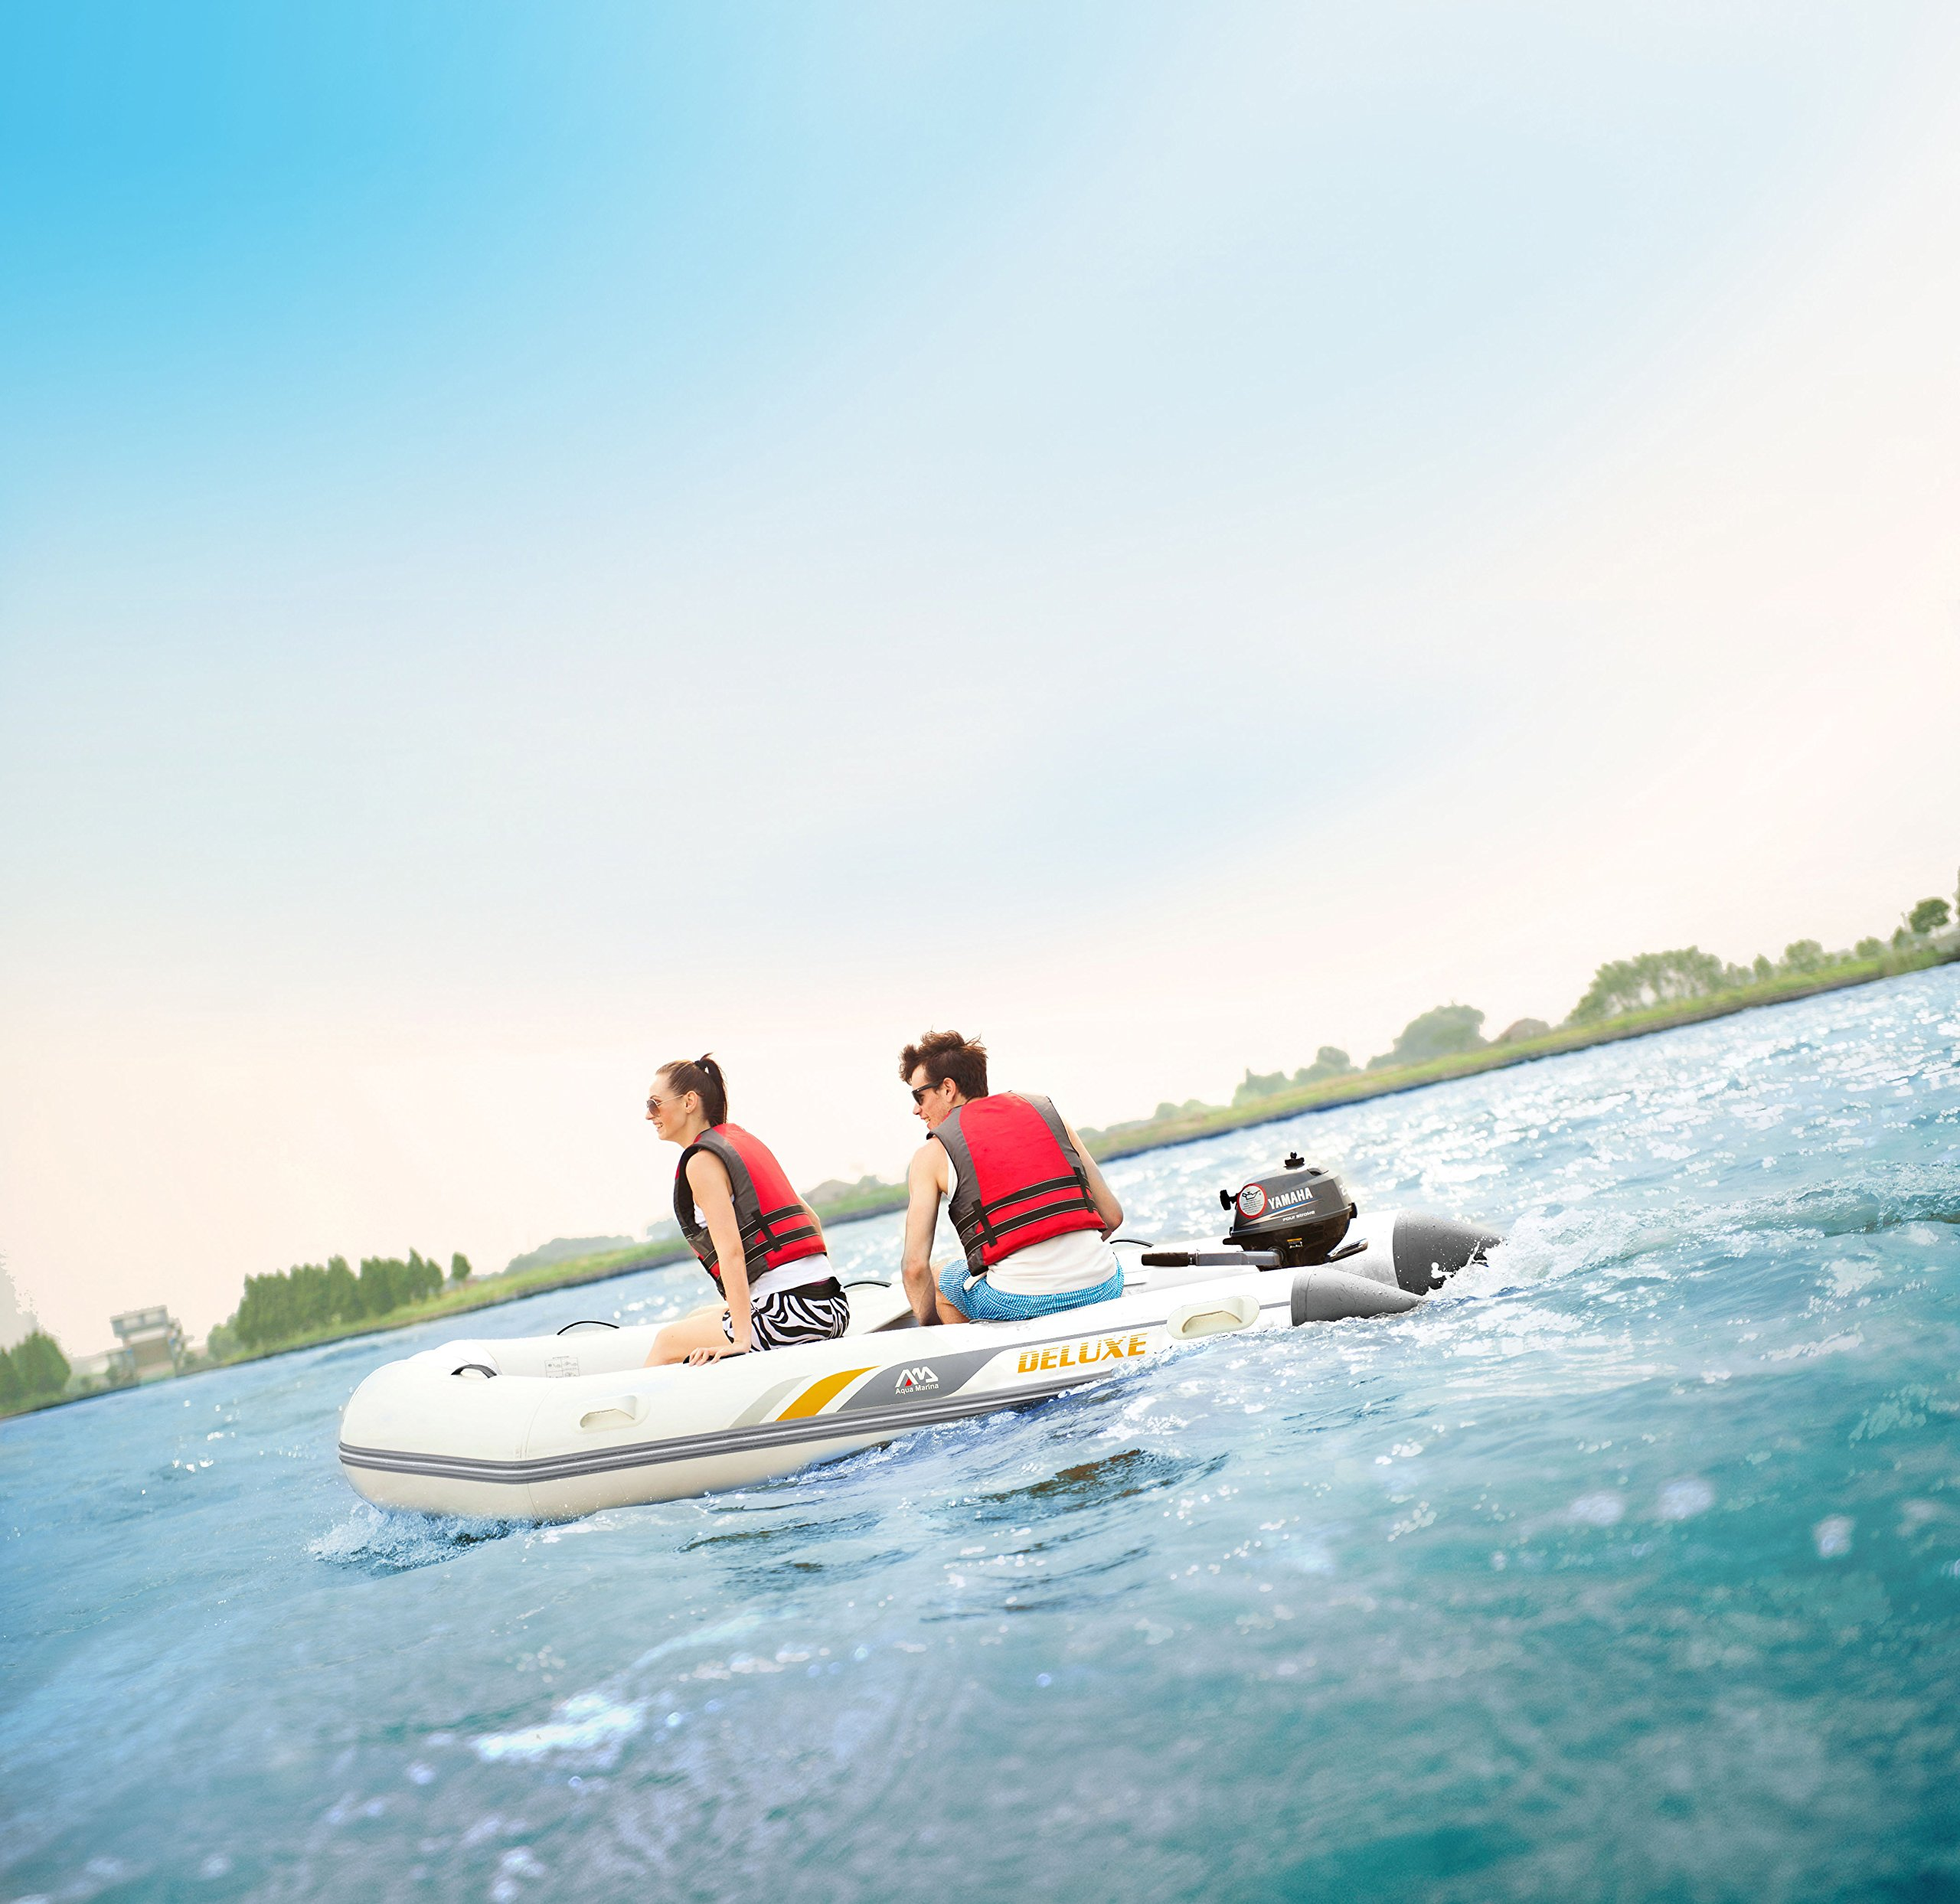 Aqua Marina bt-888302.50m Deluxe Inflatable Speed Boat